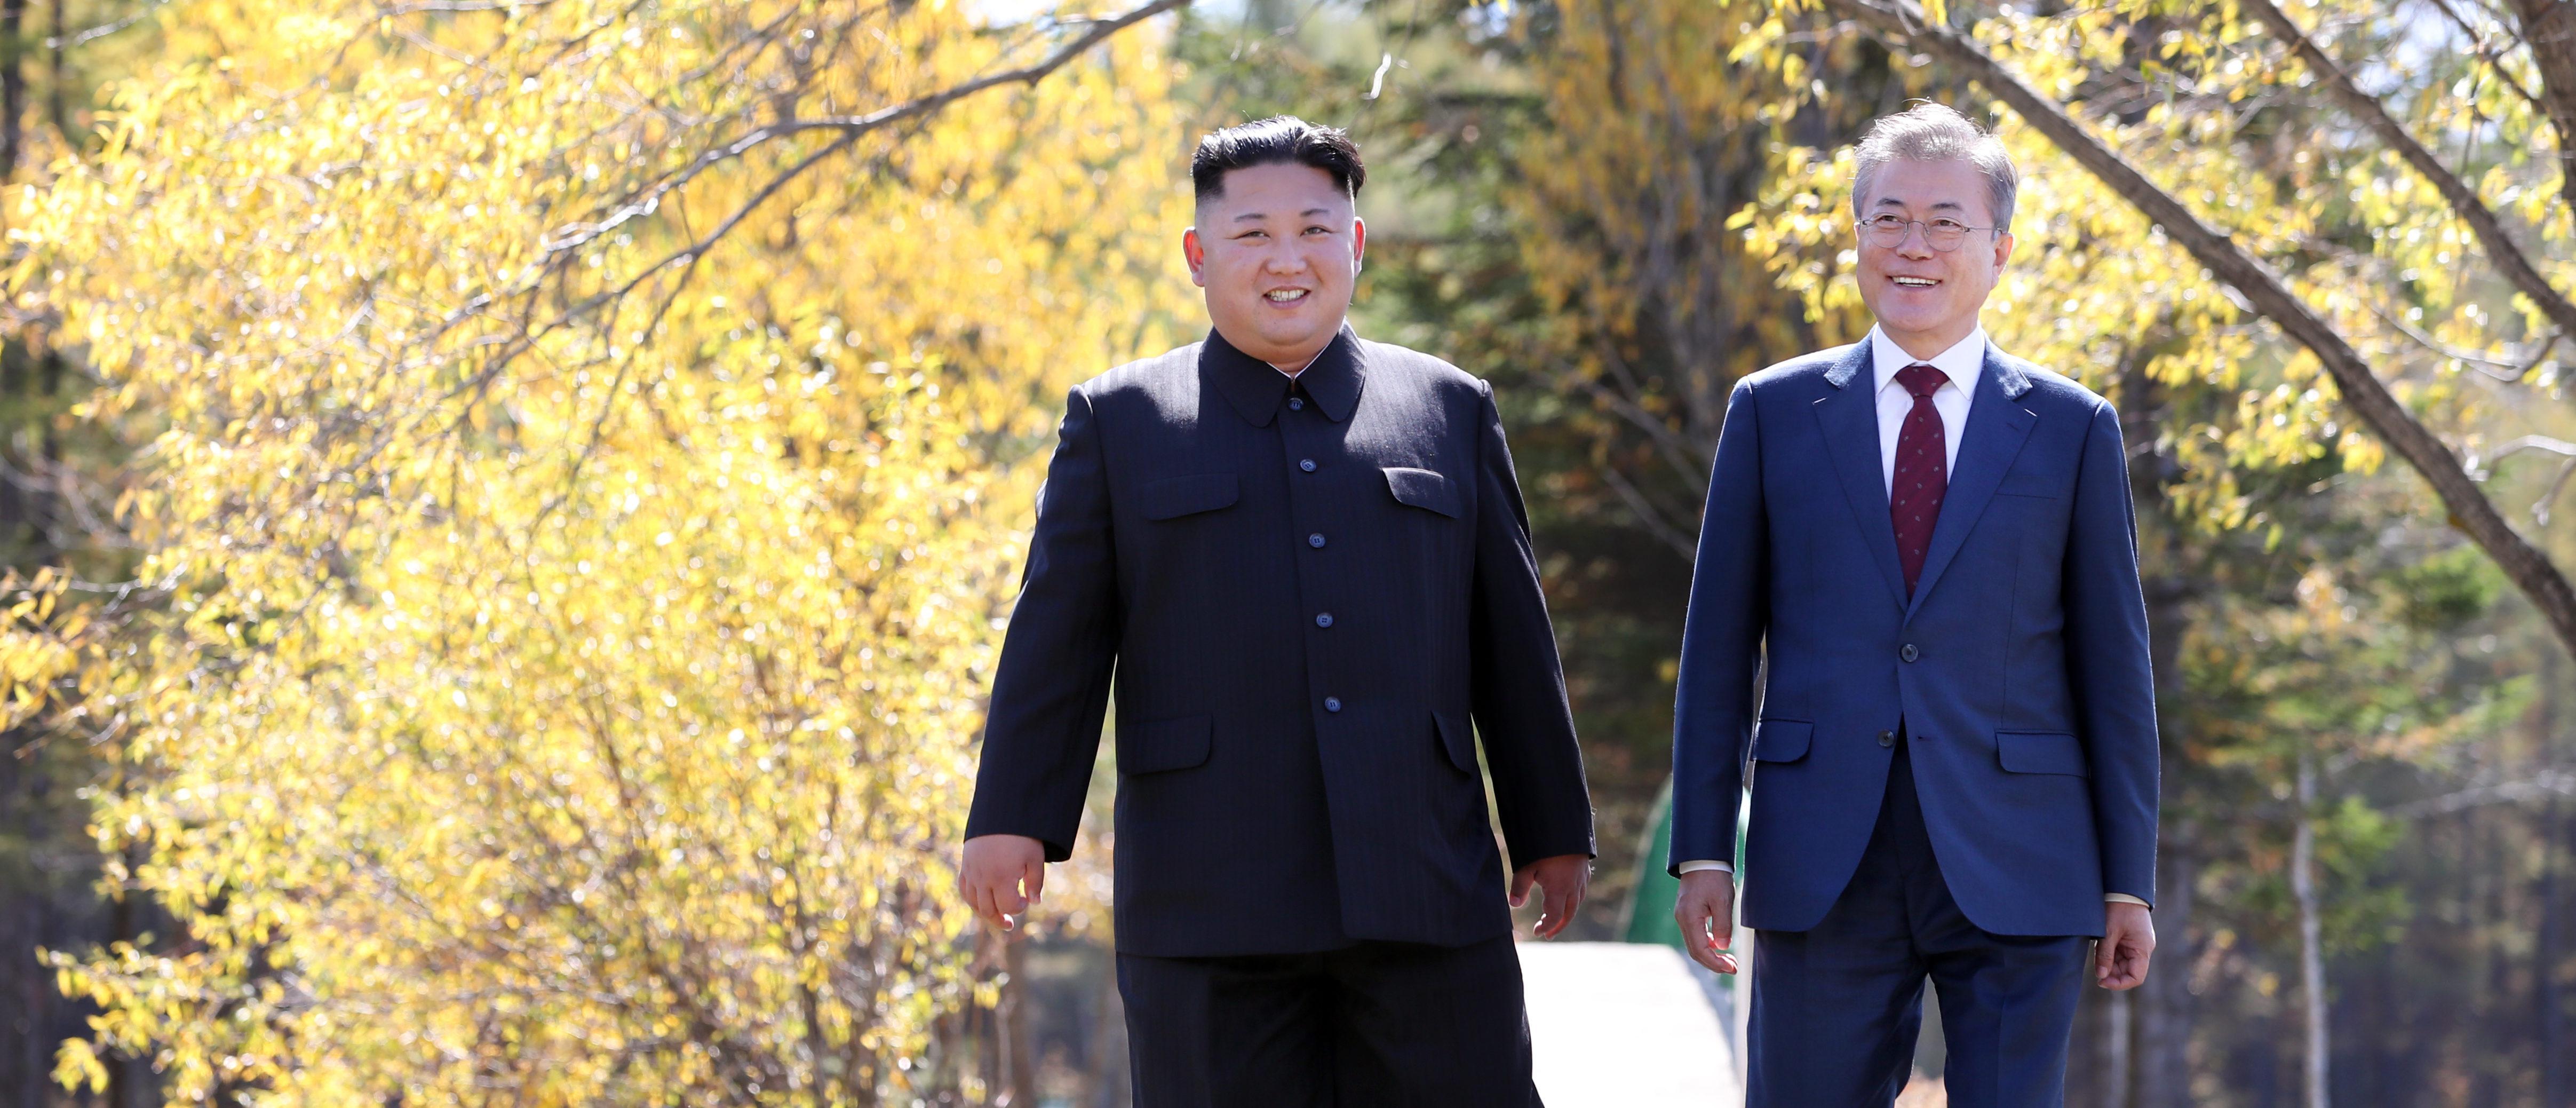 SAMJIYON, NORTH KOREA - SEPTEMBER 20: North Korea's leader Kim Jong Un (L) and South Korean President Moon Jae-in (R) walk together during a visit to Samjiyon guesthouse on September 20, 2018 in Samjiyon, North Korea. (Pyeongyang Press Corps/Pool/Getty Images)